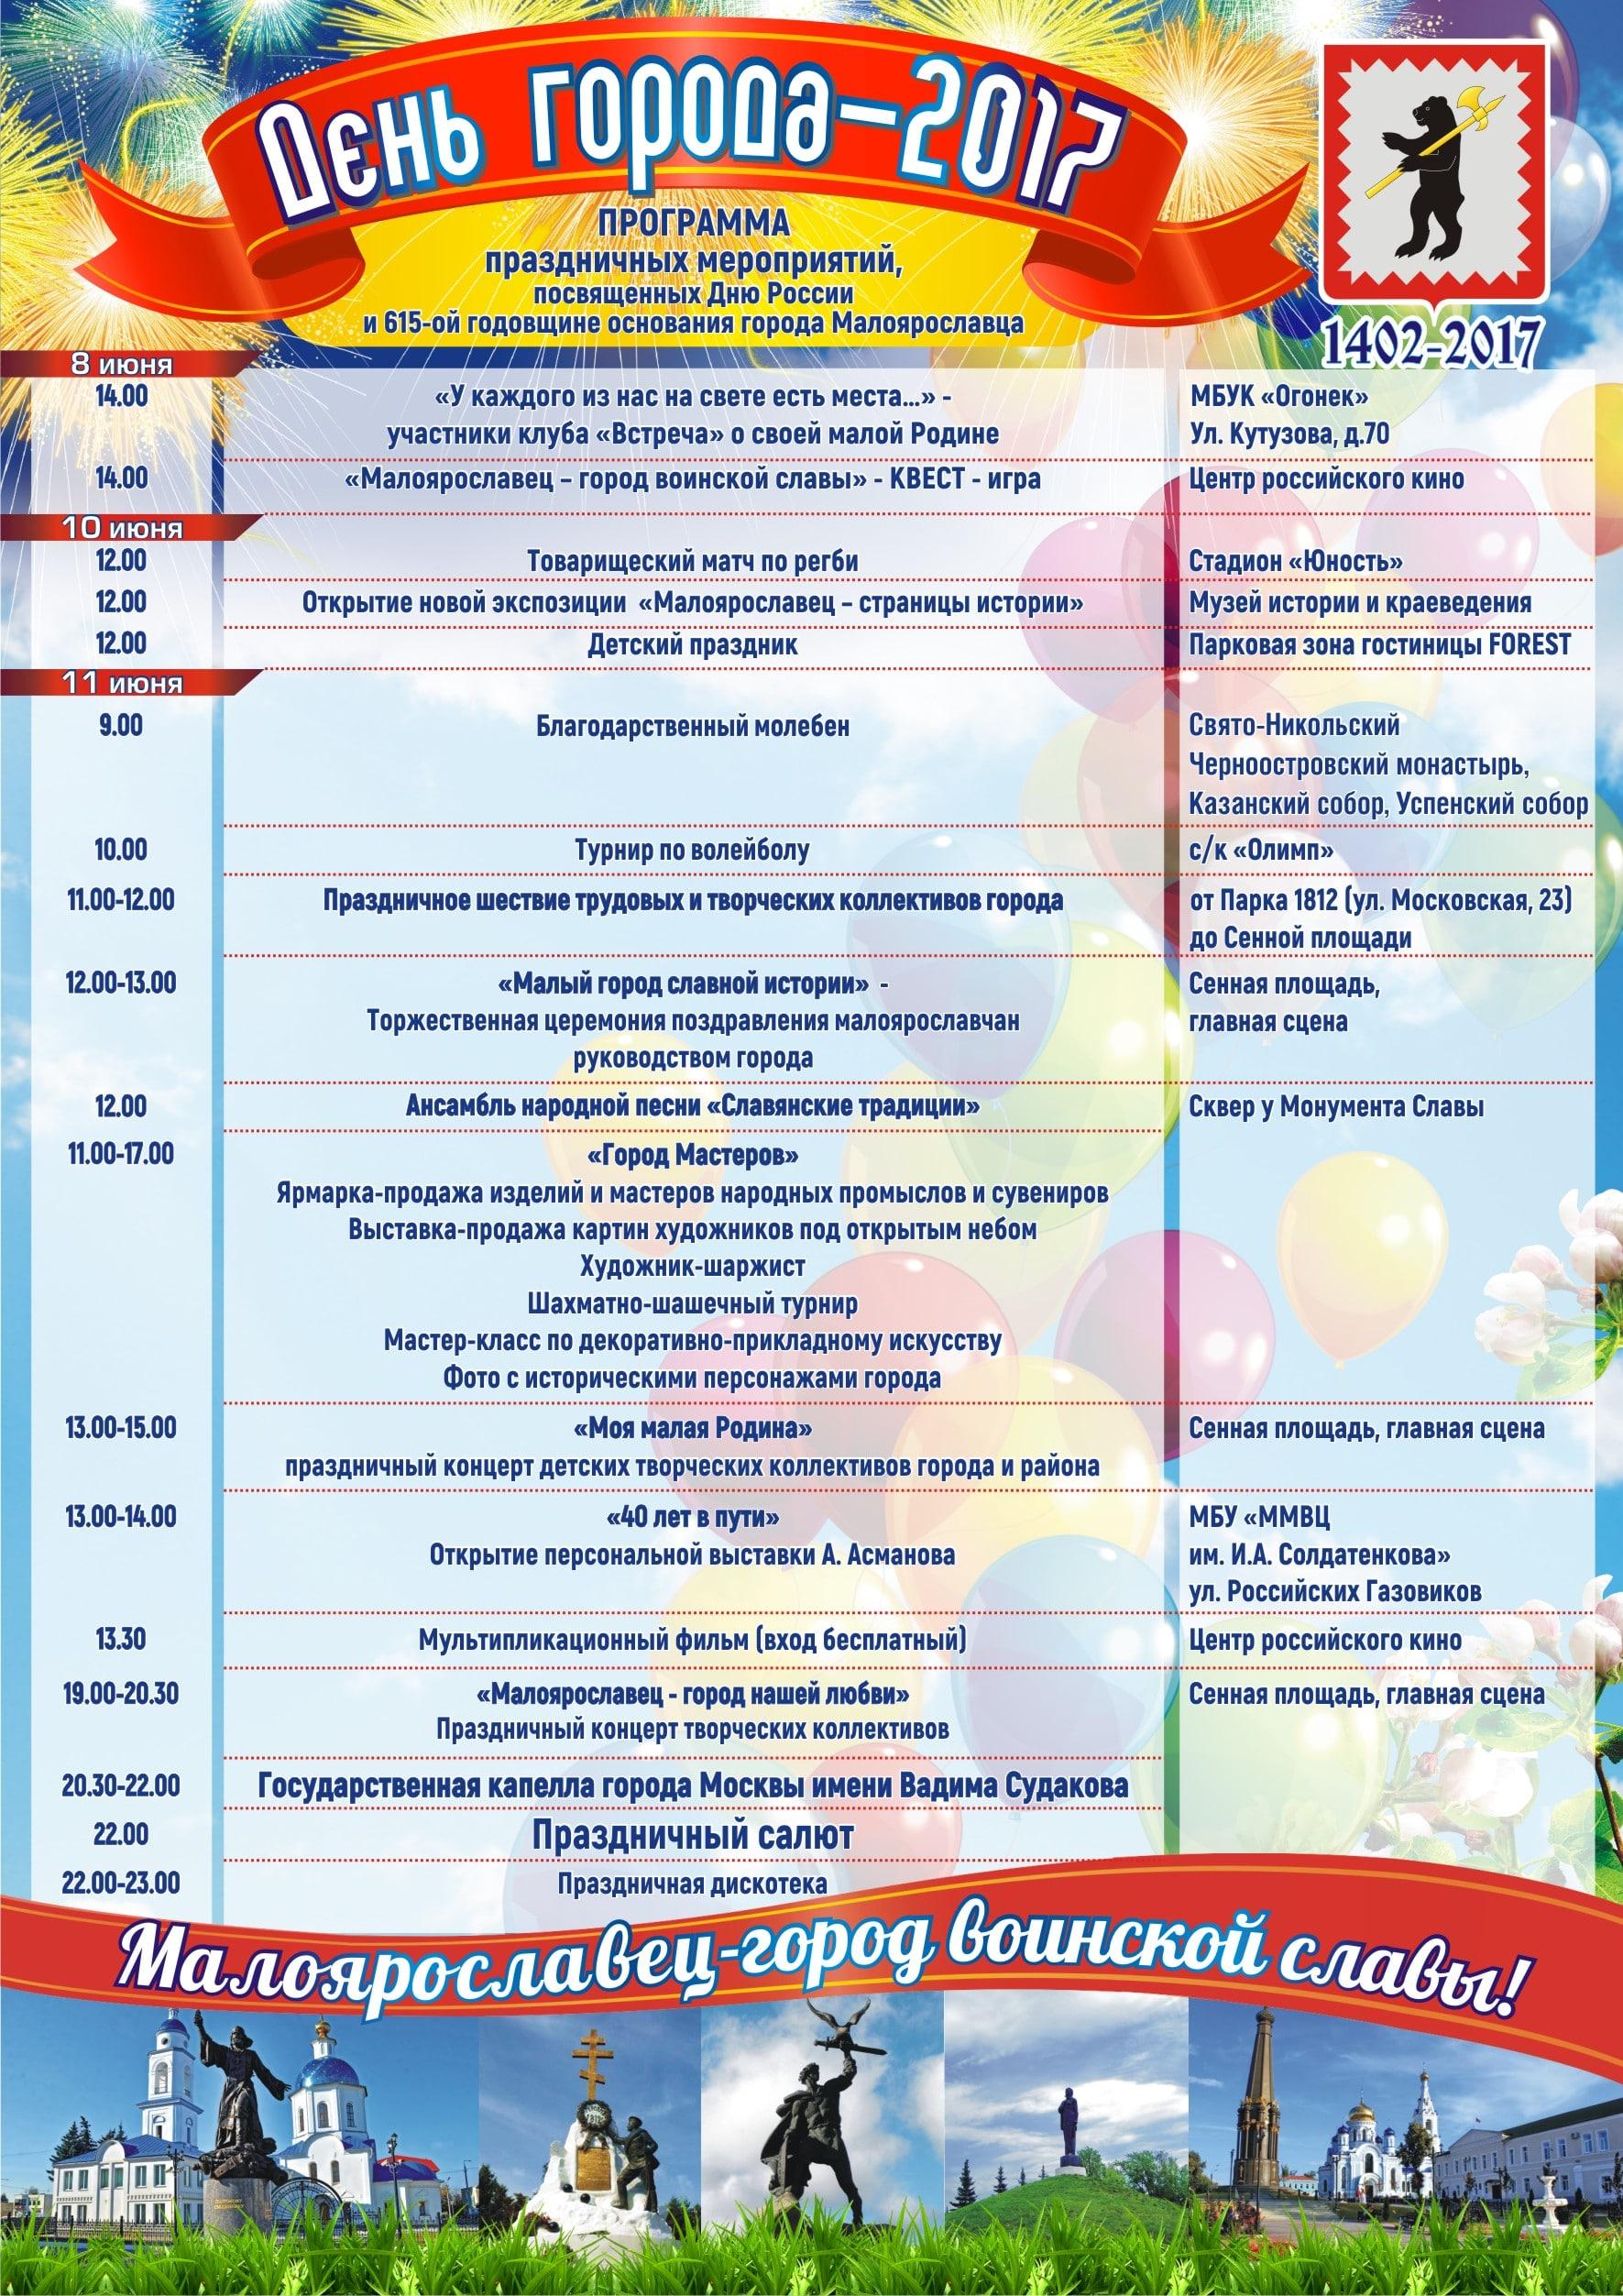 День Города Малоярославца 2017 программа мероприятий, когда салют